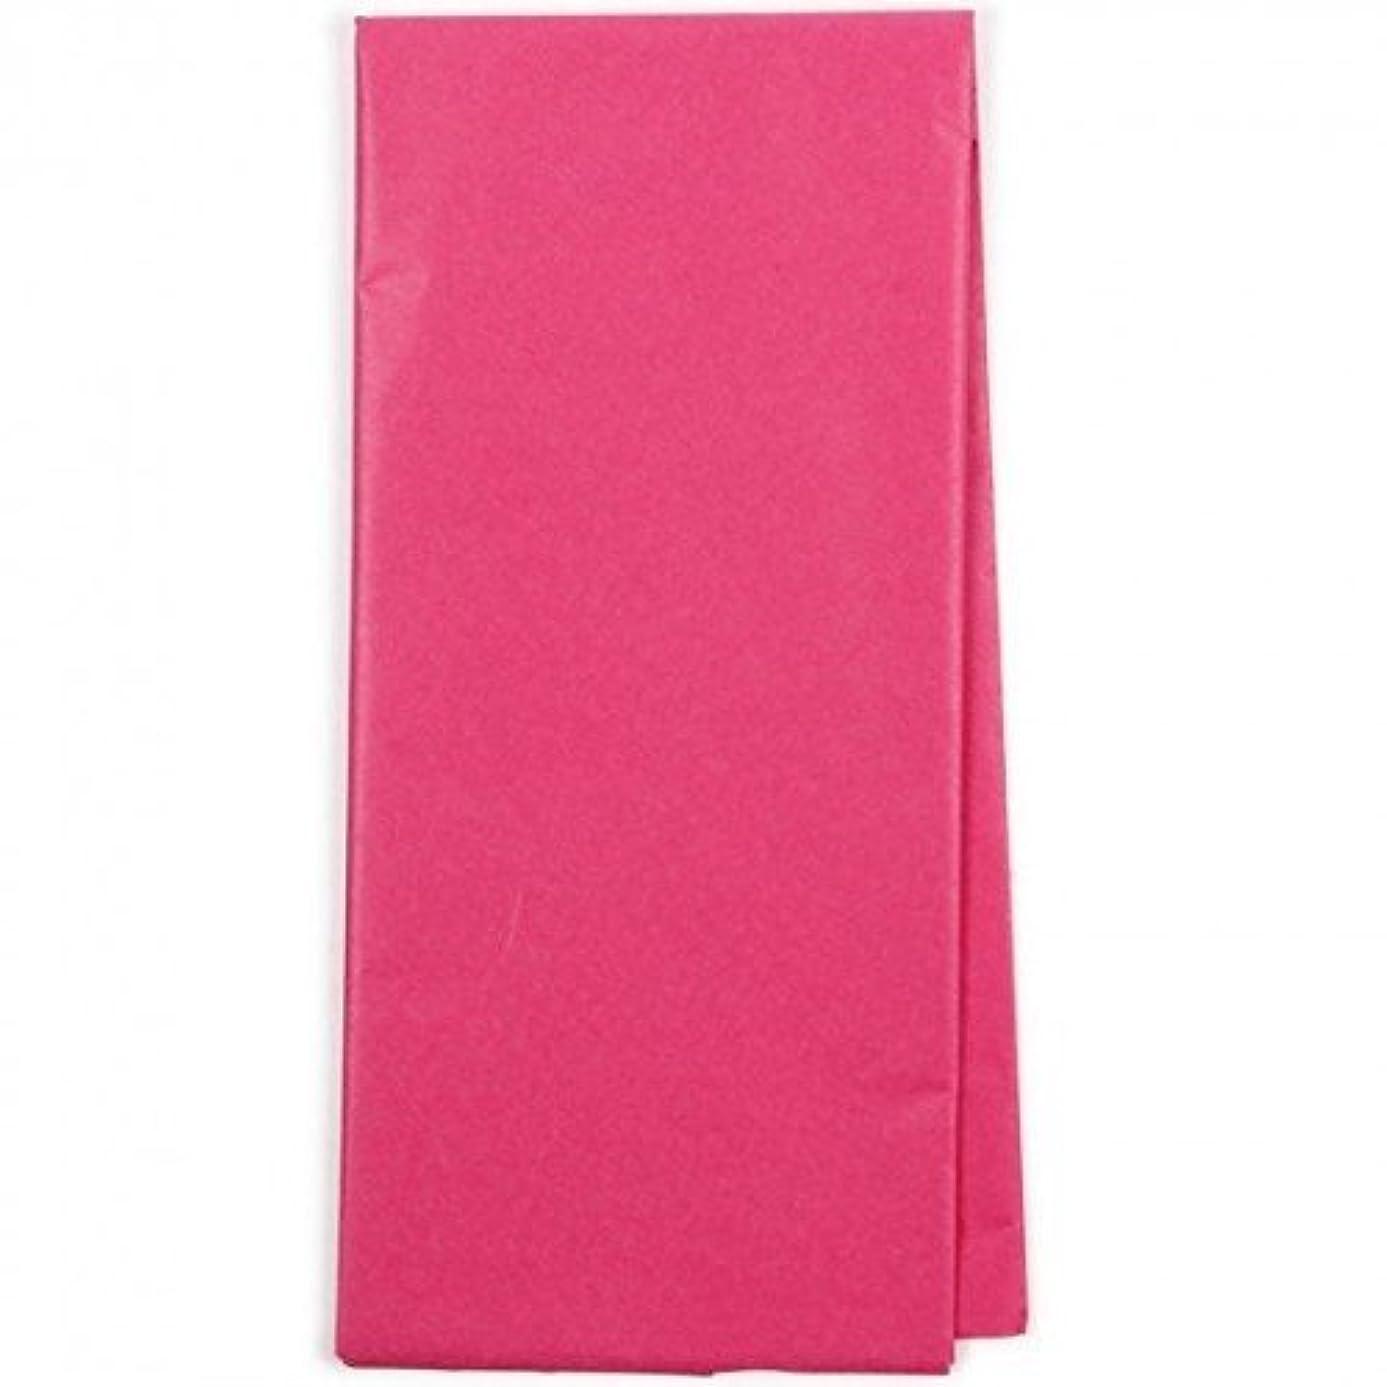 RetailSource MF1201x2 100 sheet pack Tissue Paper (2 pack), Magenta, 20